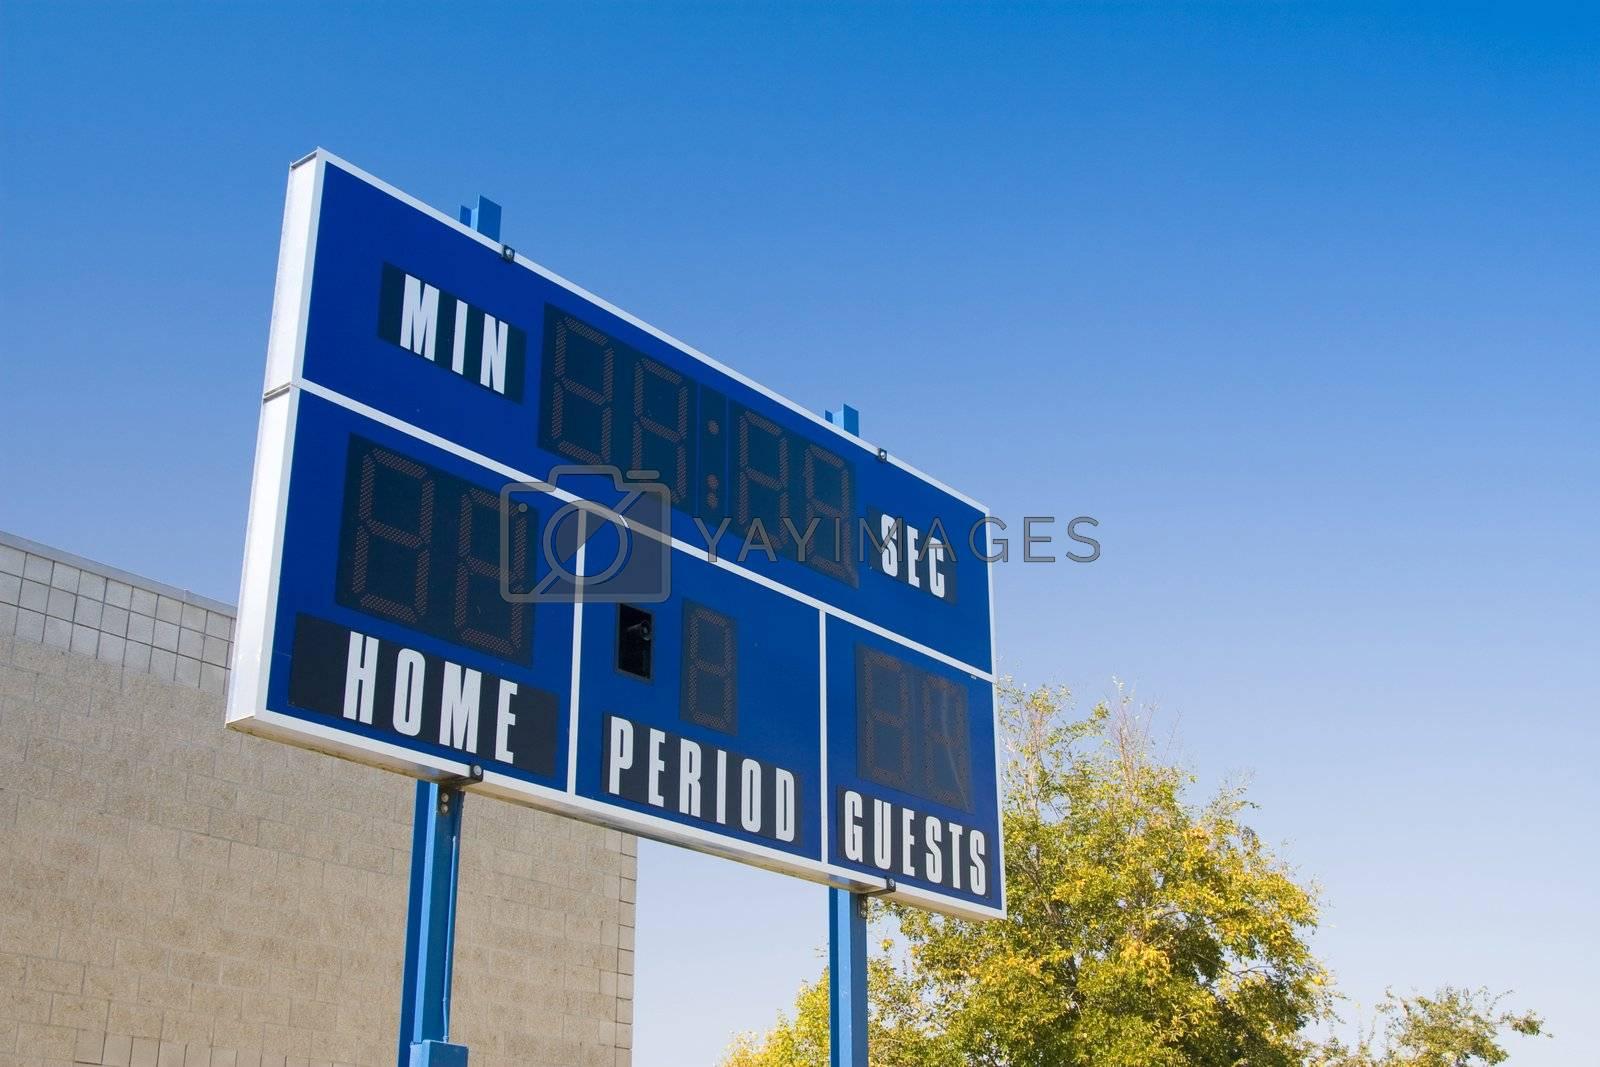 Sports arena scoreboard